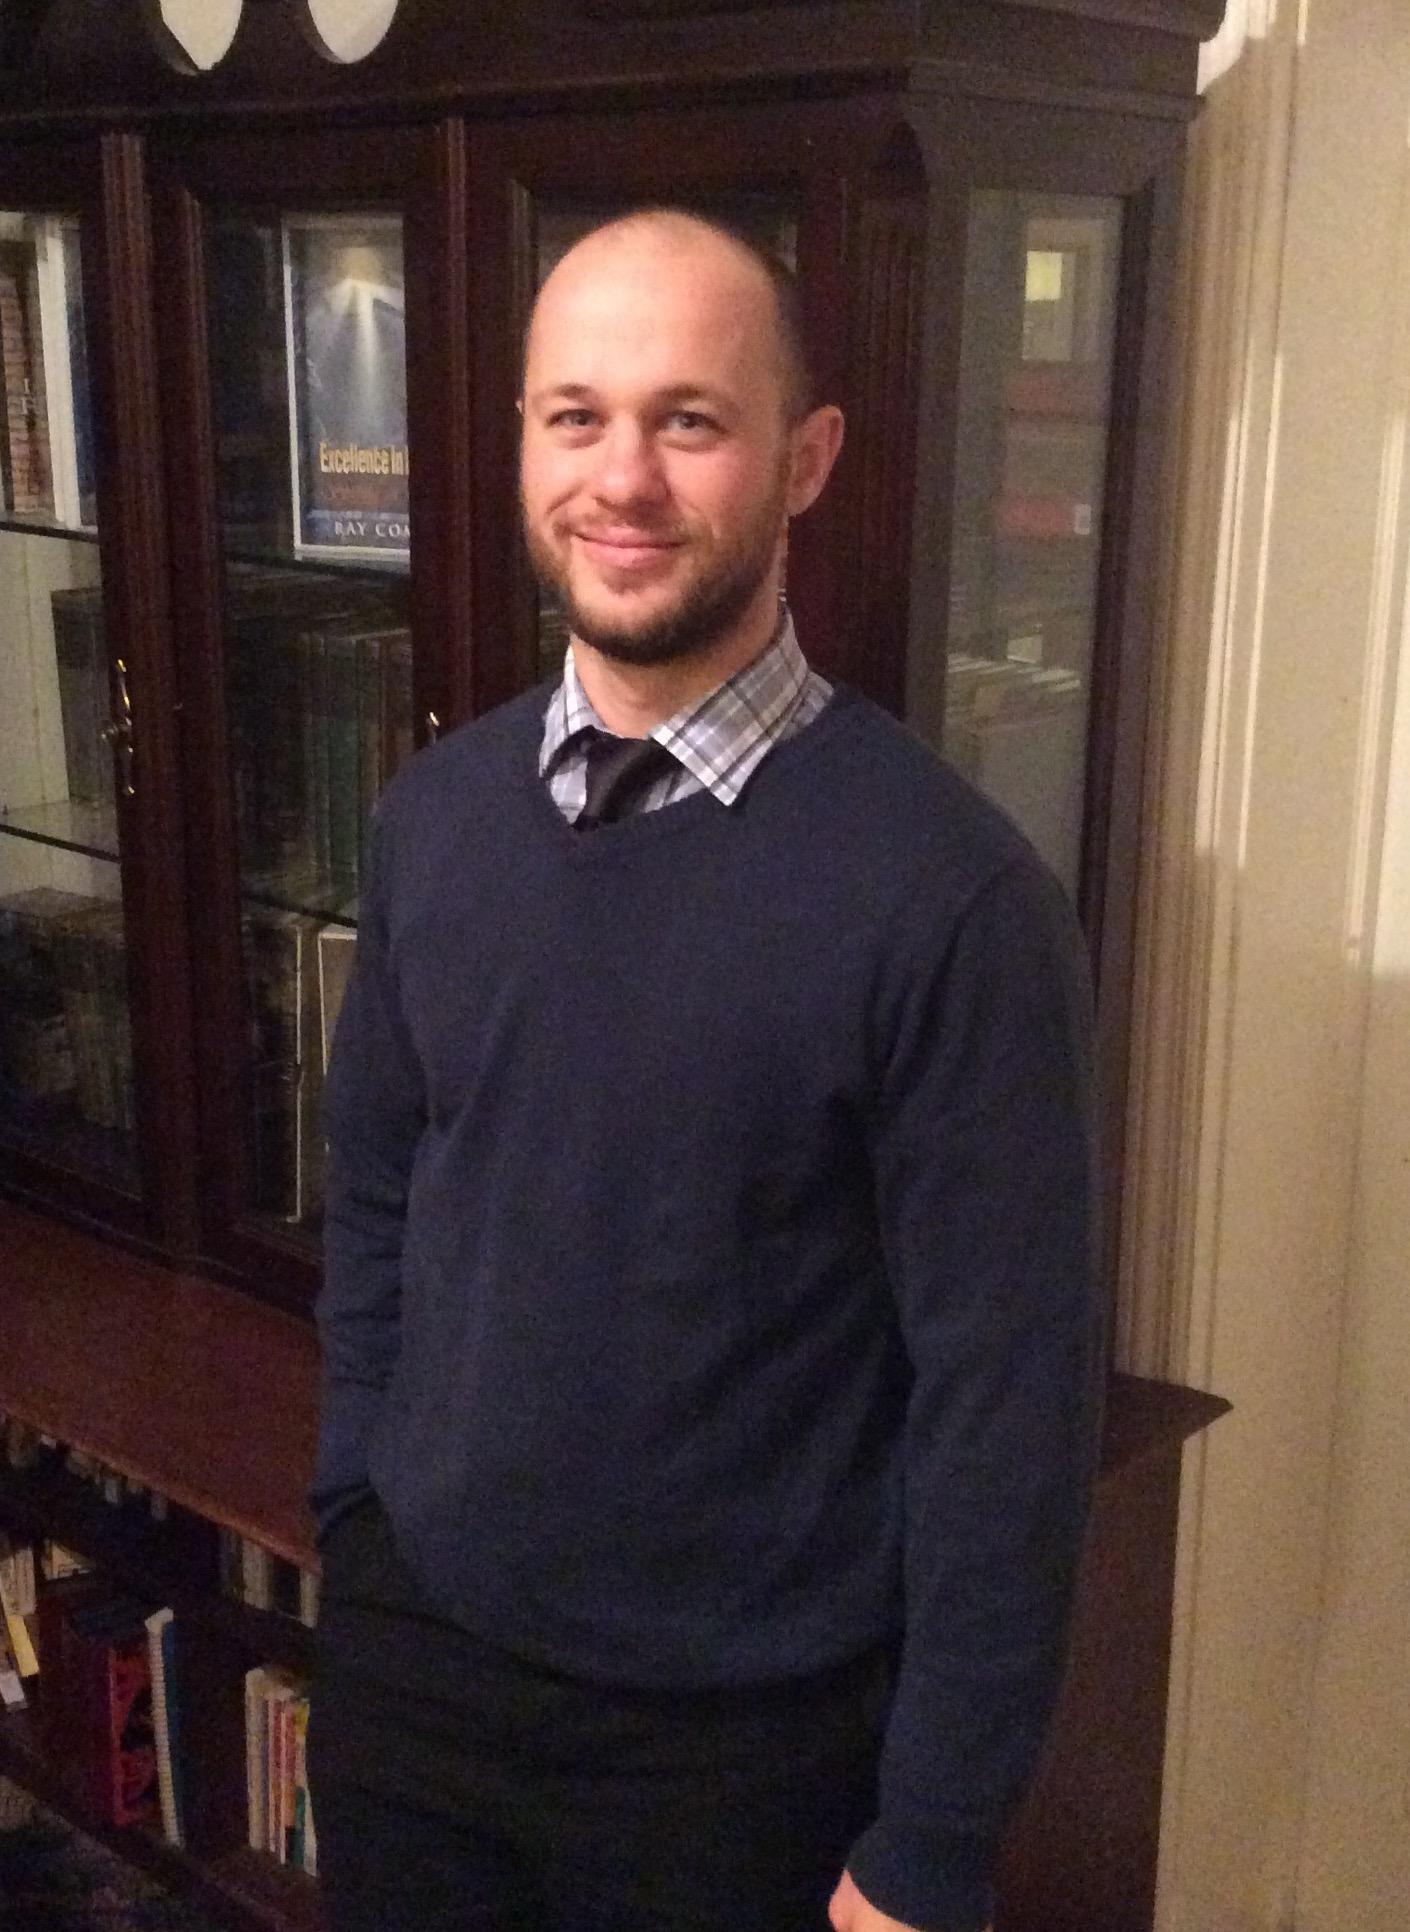 Picture of Deacon Michael Hollinshead